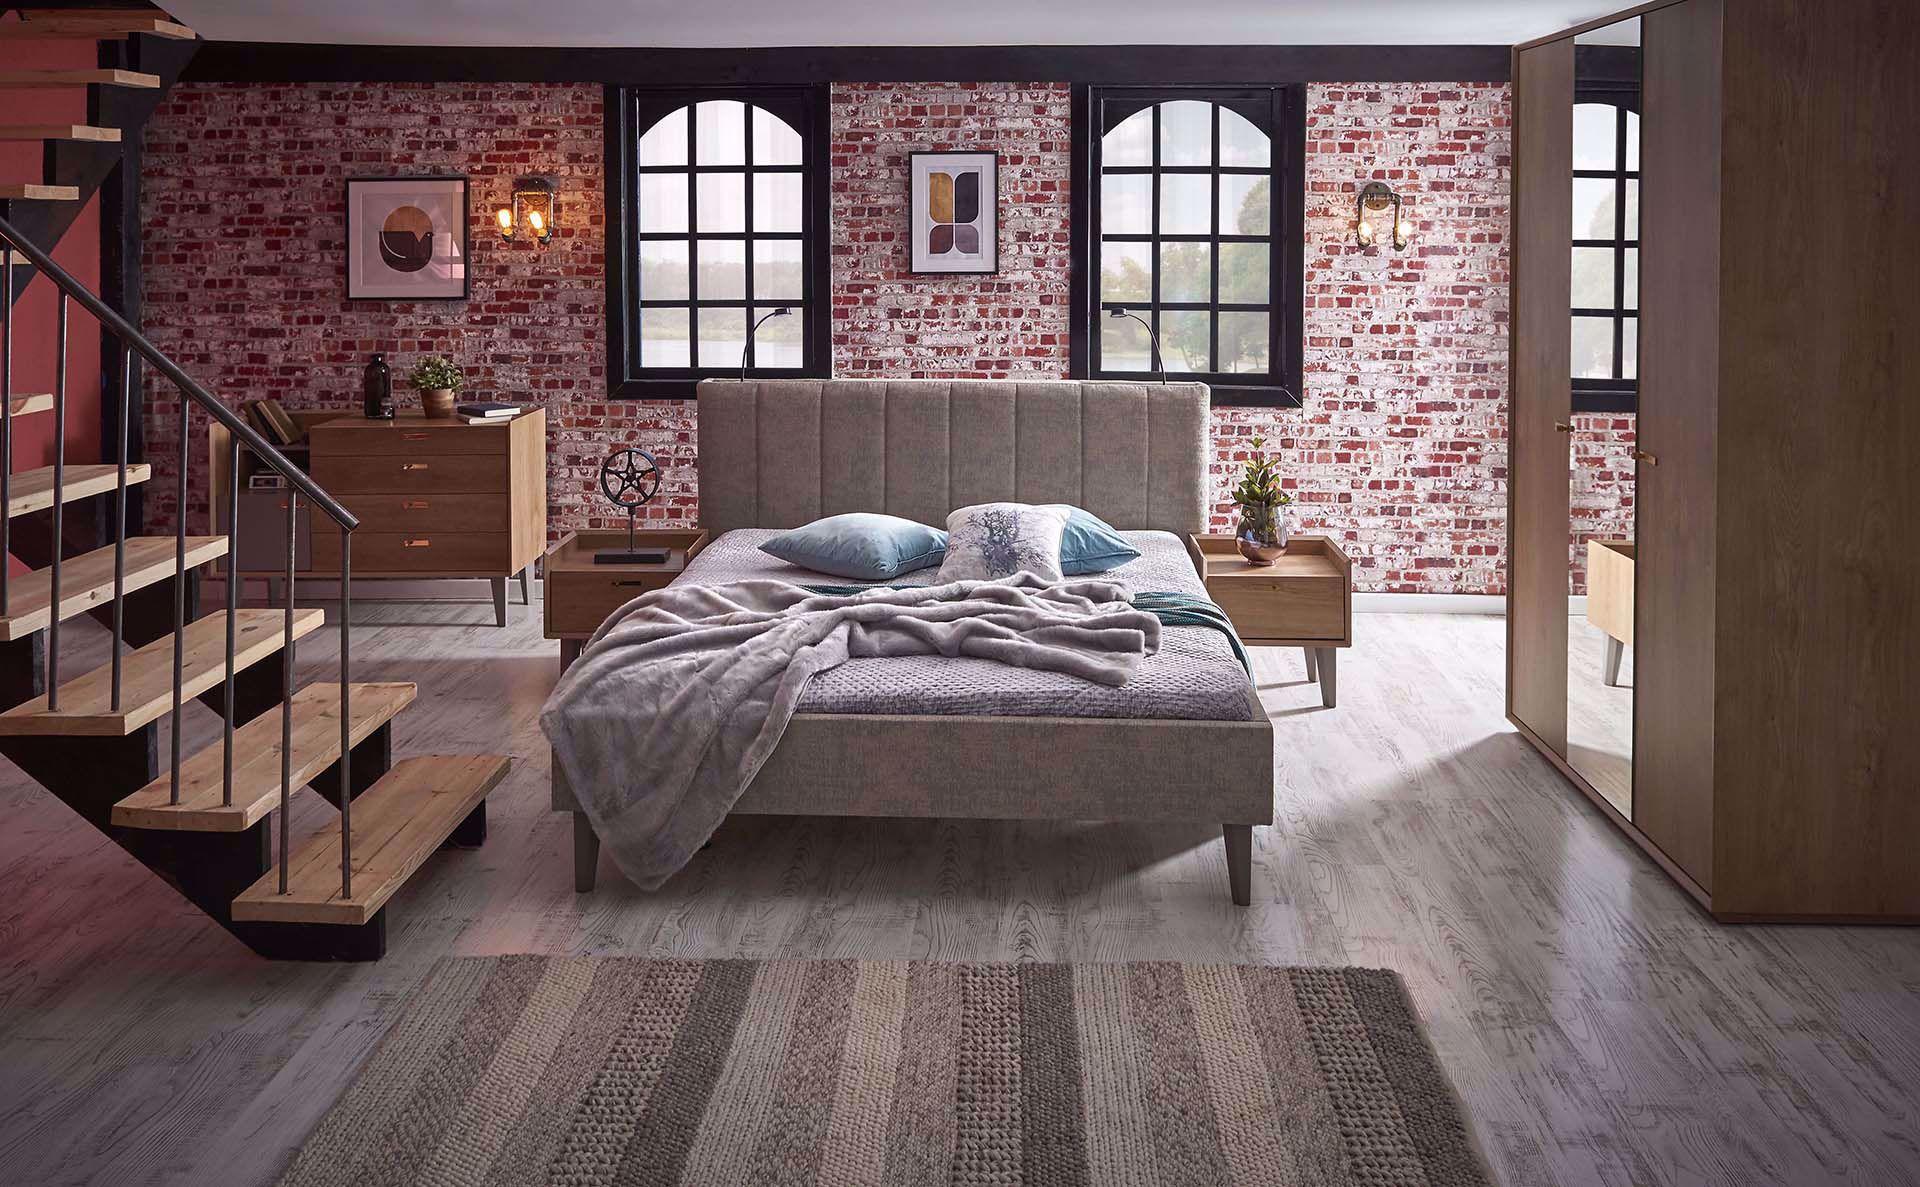 Hesperia Bedroom Set